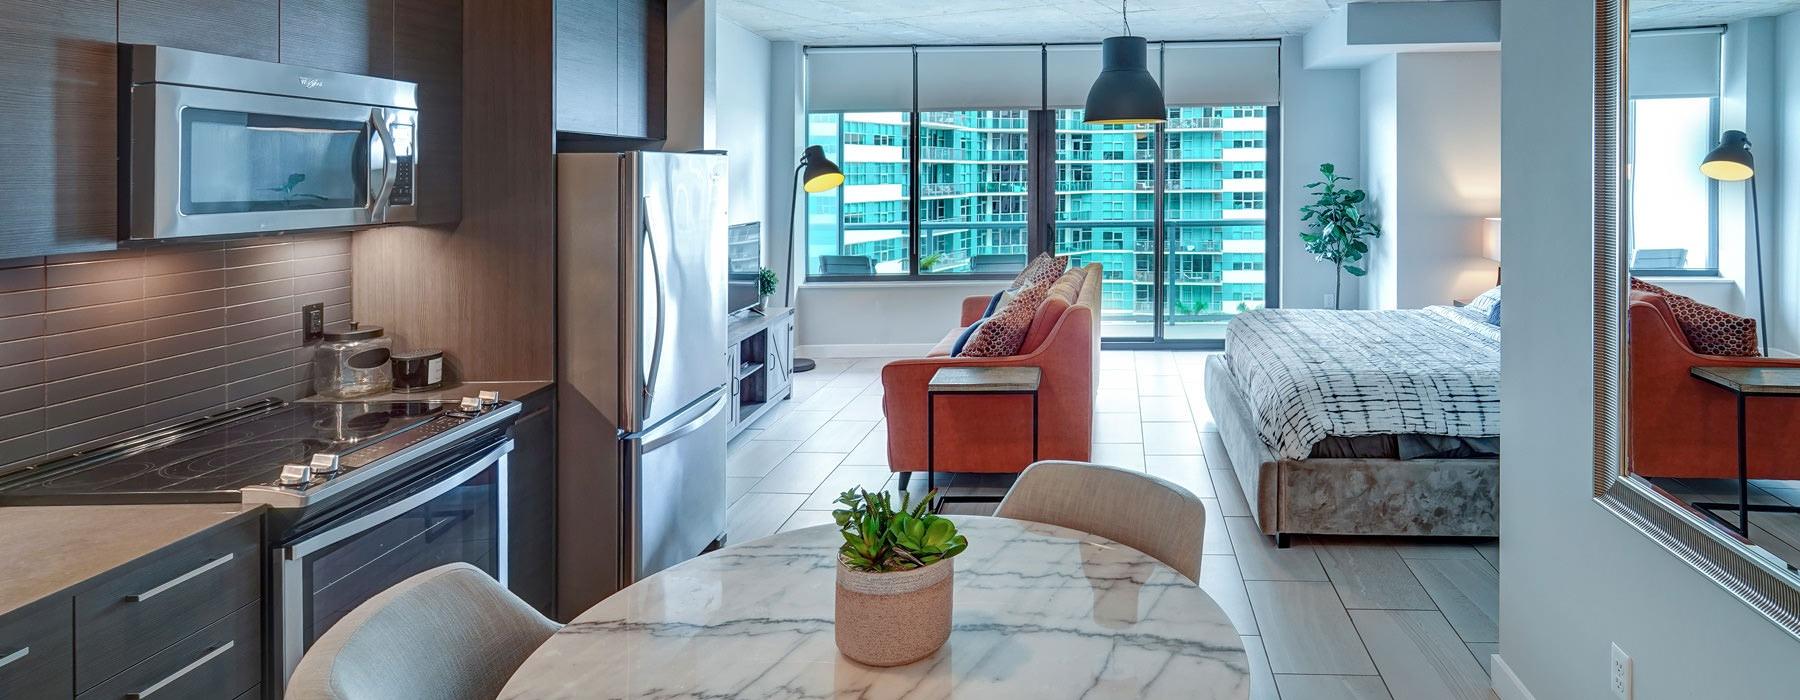 open layout of studio apartment